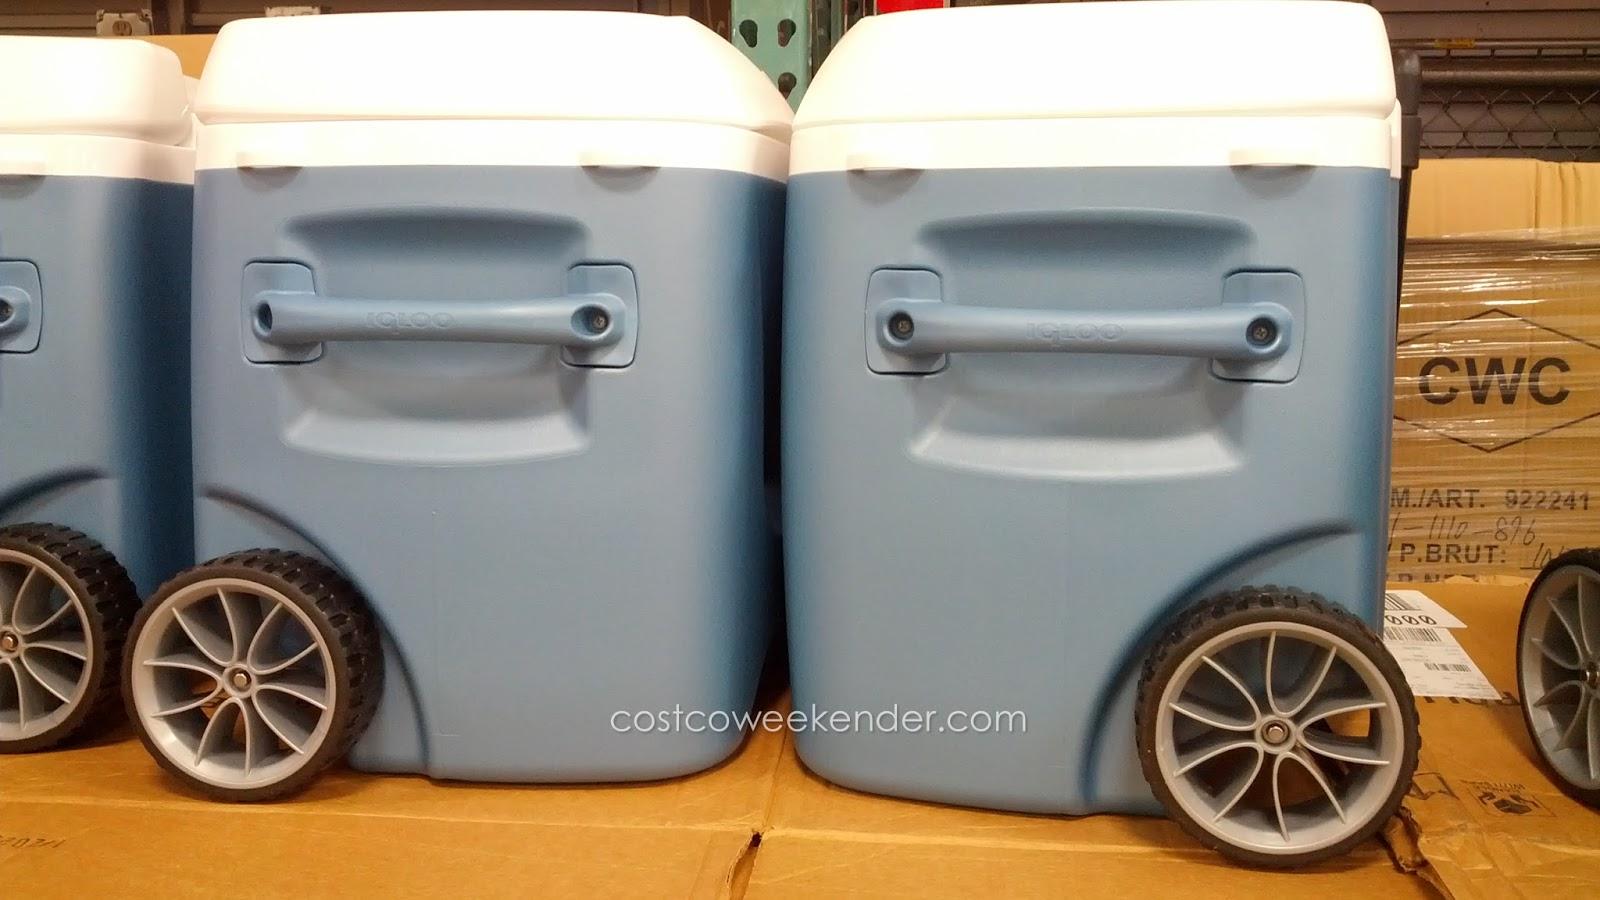 Igloo Maxcold Rolling Wheeled Cooler Costco Weekender